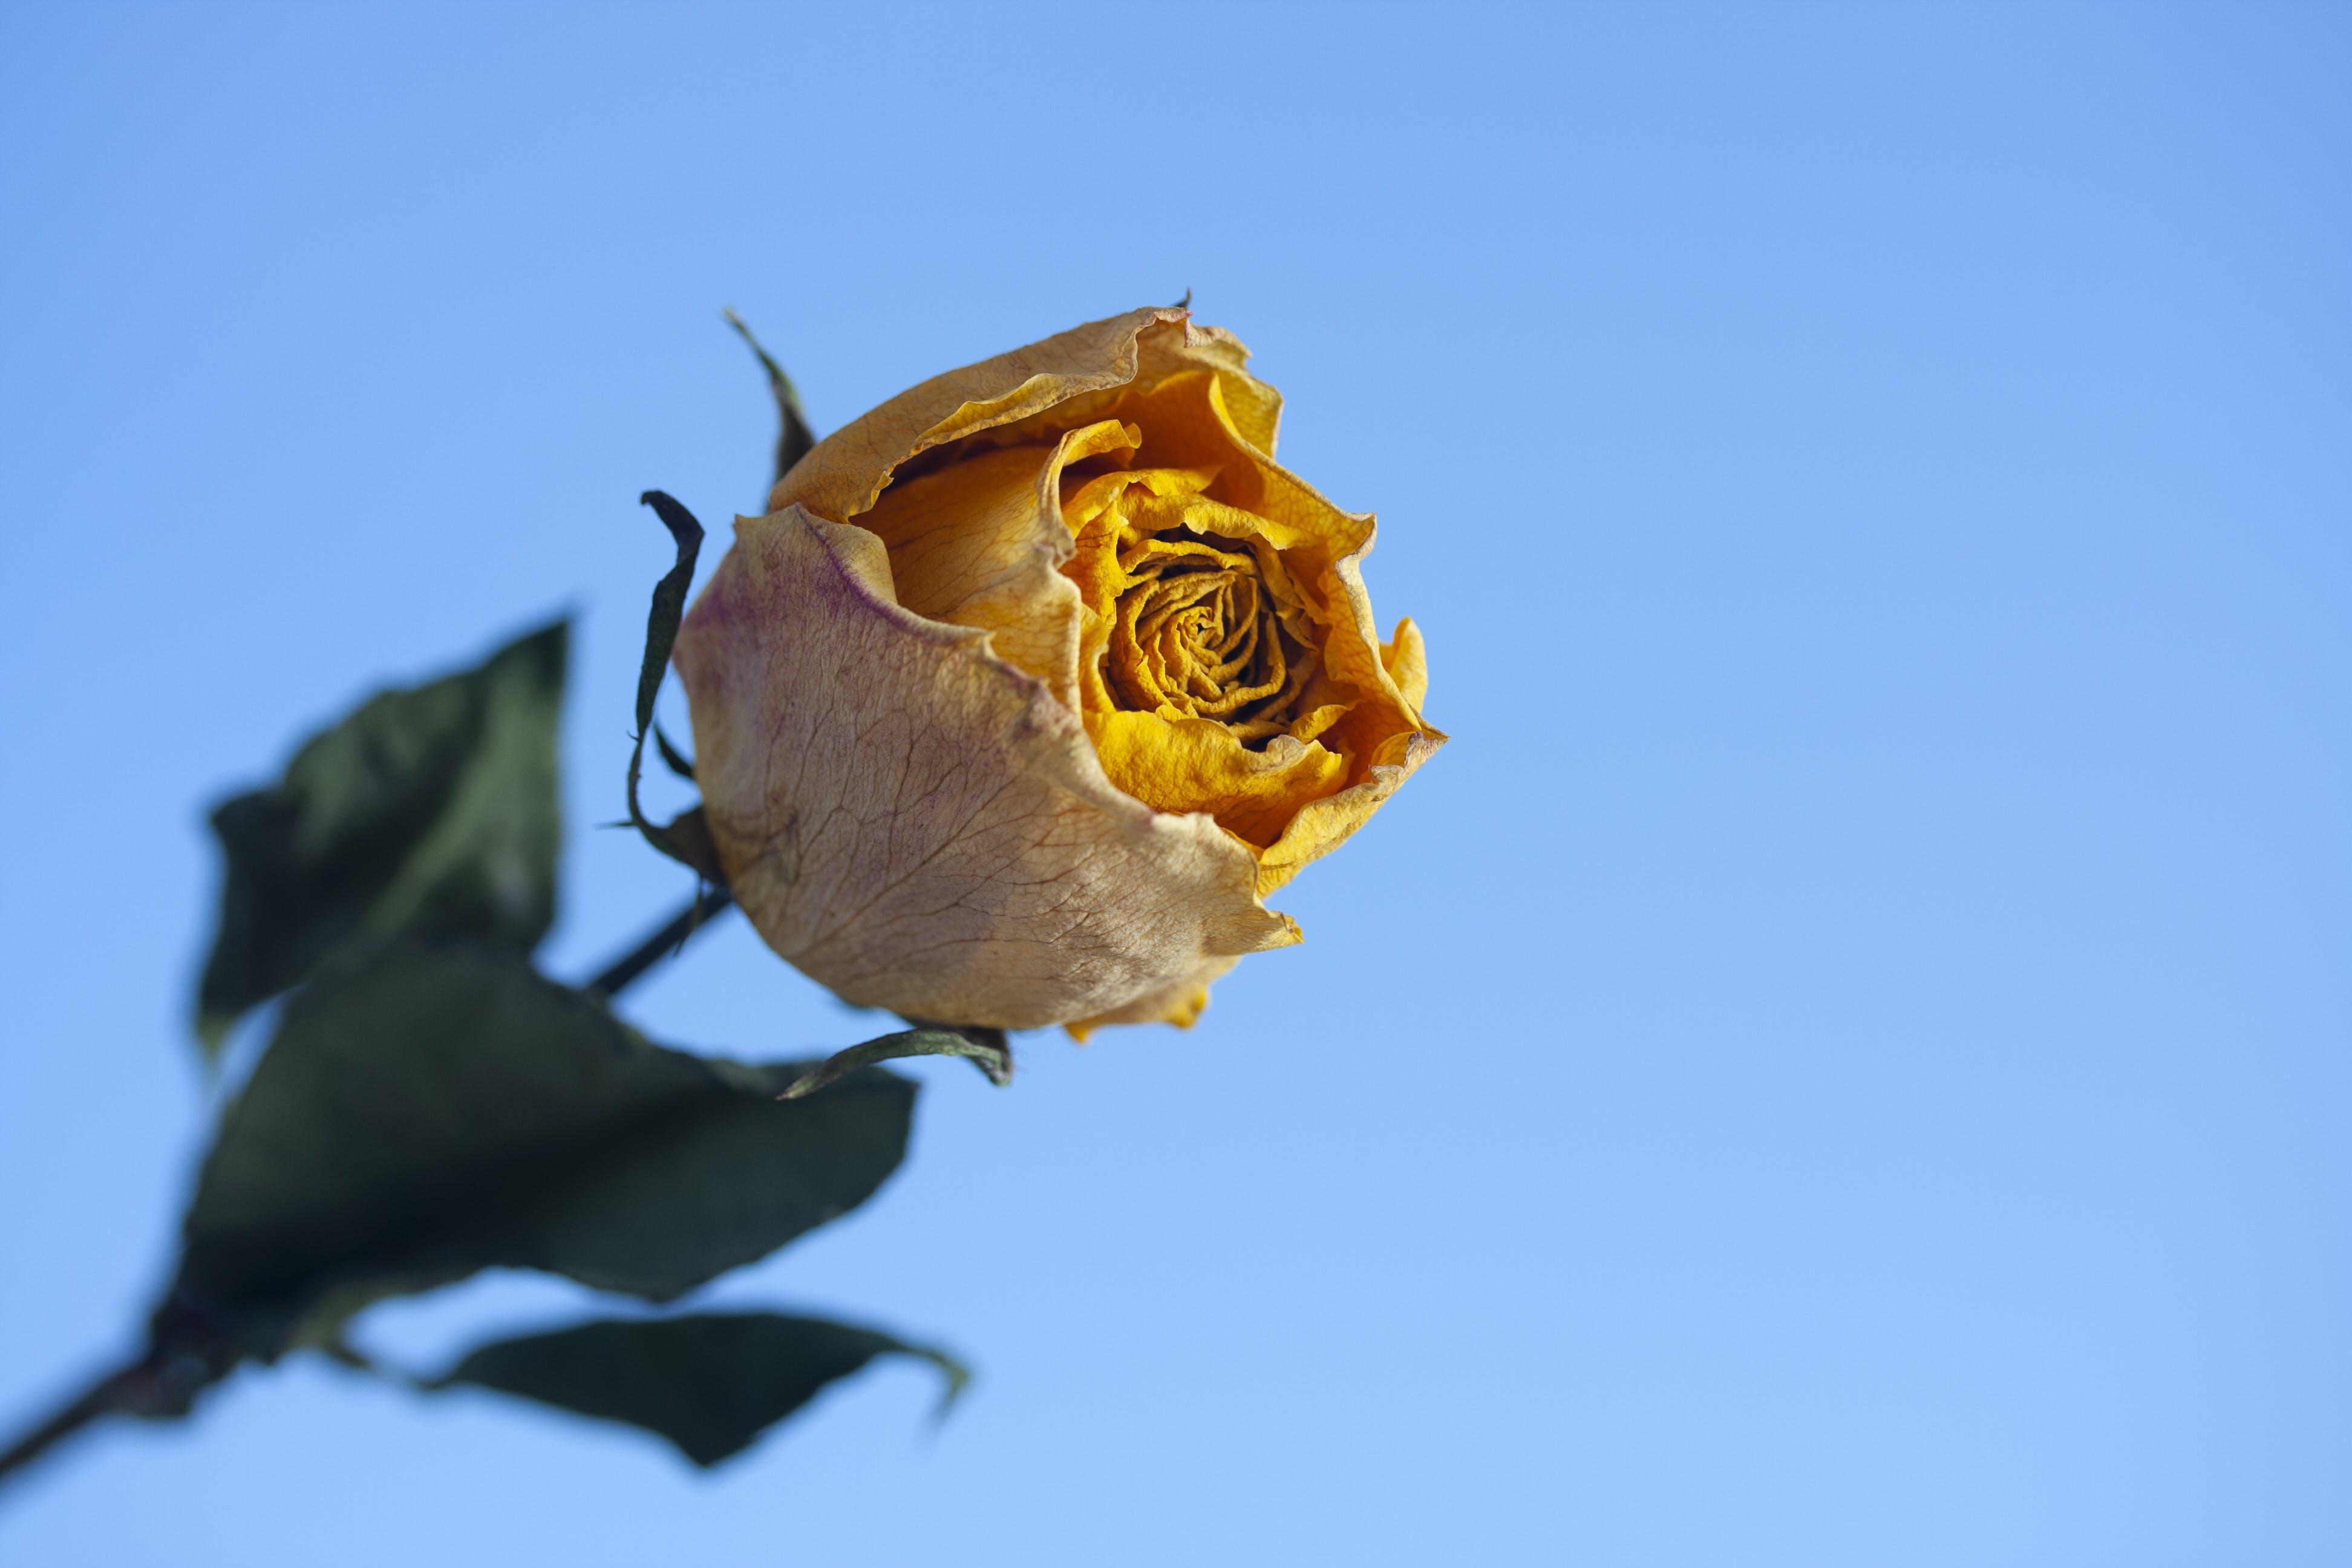 Close-Up Photo of Rose